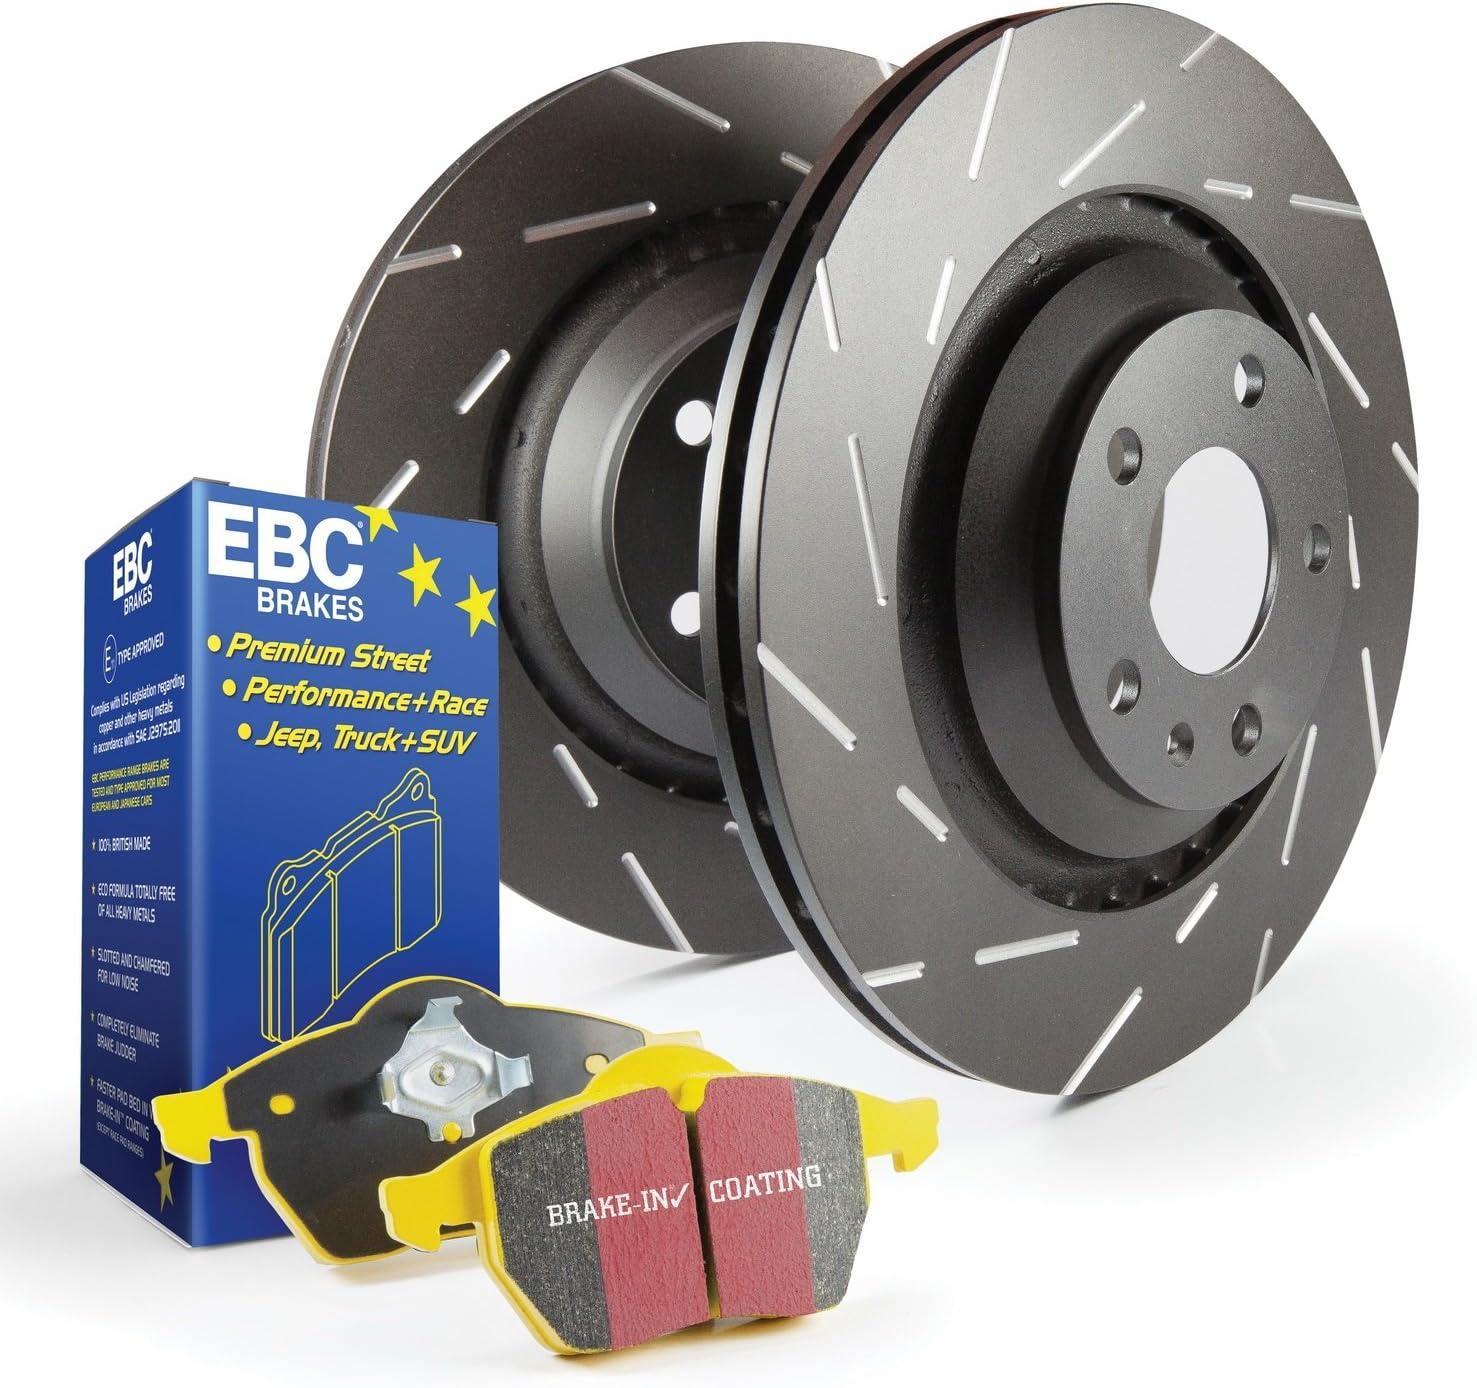 S9KR1196 EBC Brakes S9 Rear Kits Yellowstuff and USR Rotors